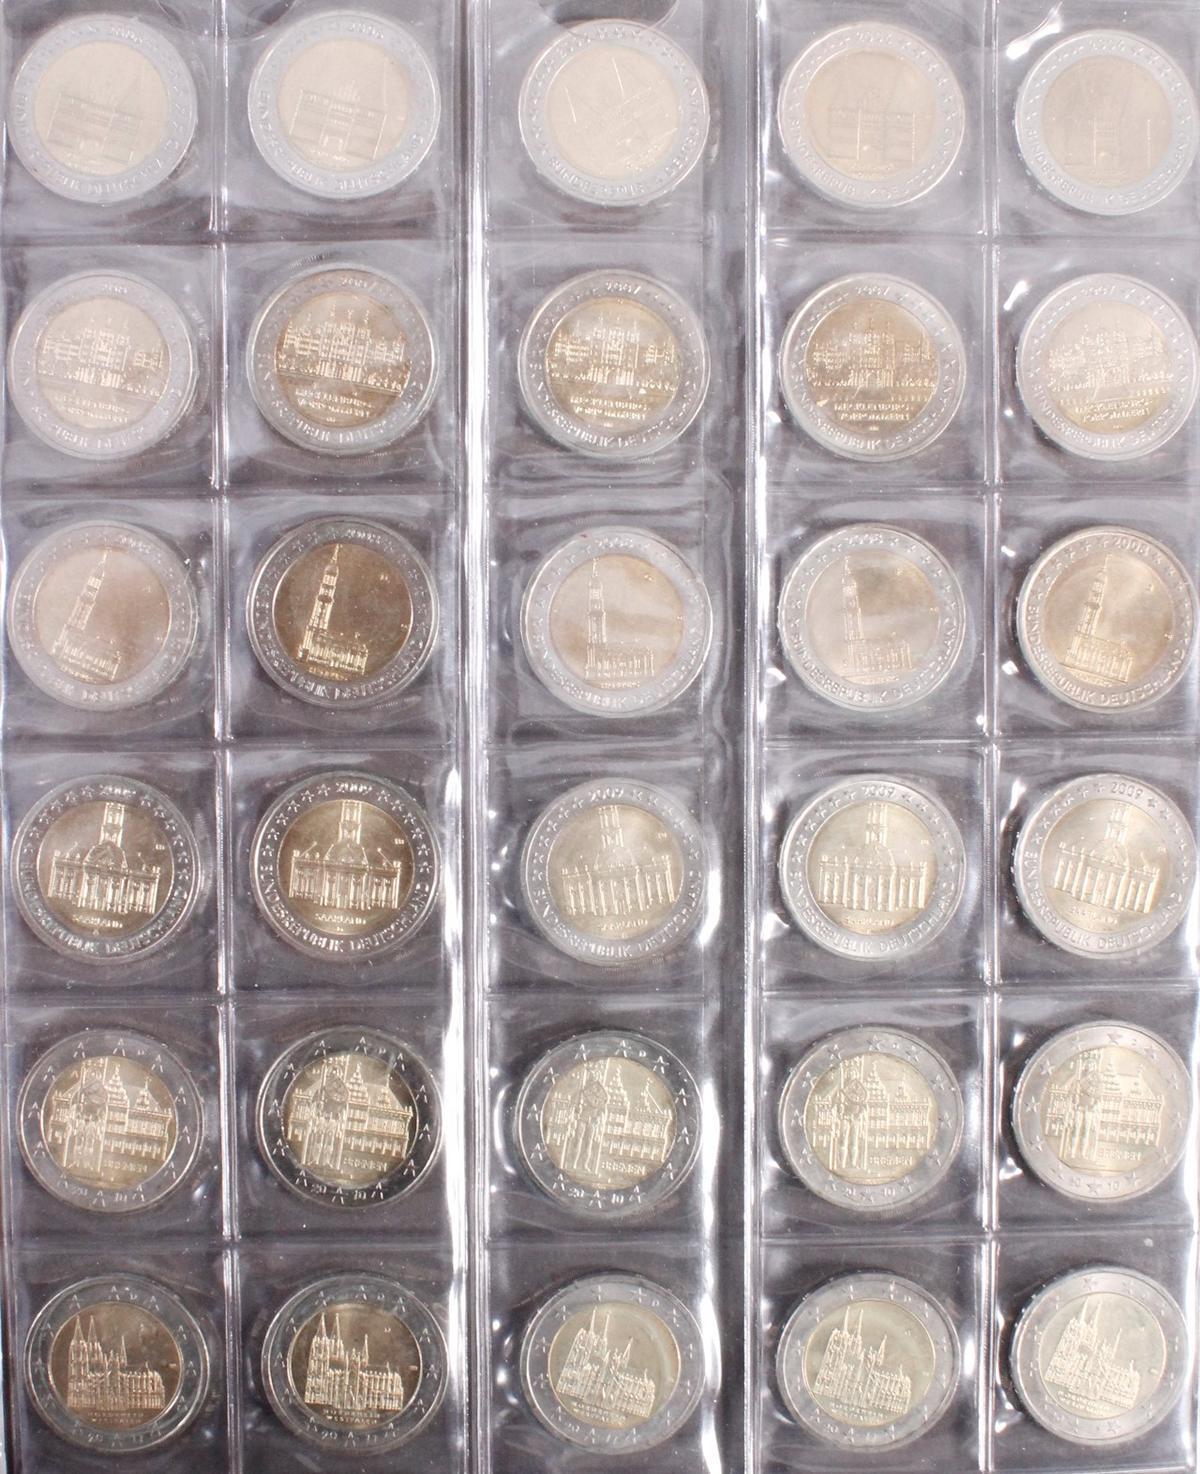 BRD, 2 Euro Sondermünzen